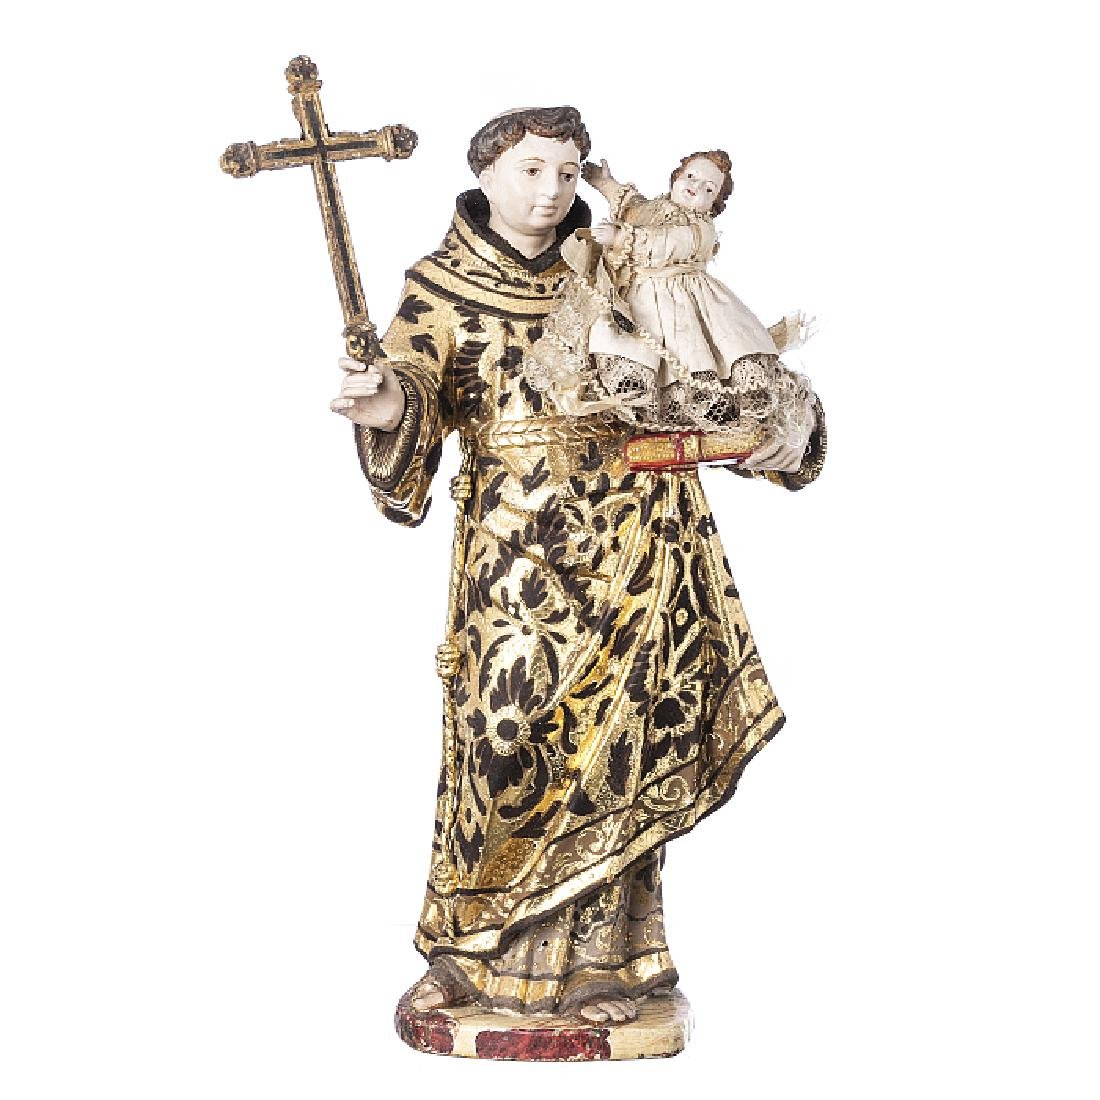 Saint Anthony with Child Jesus